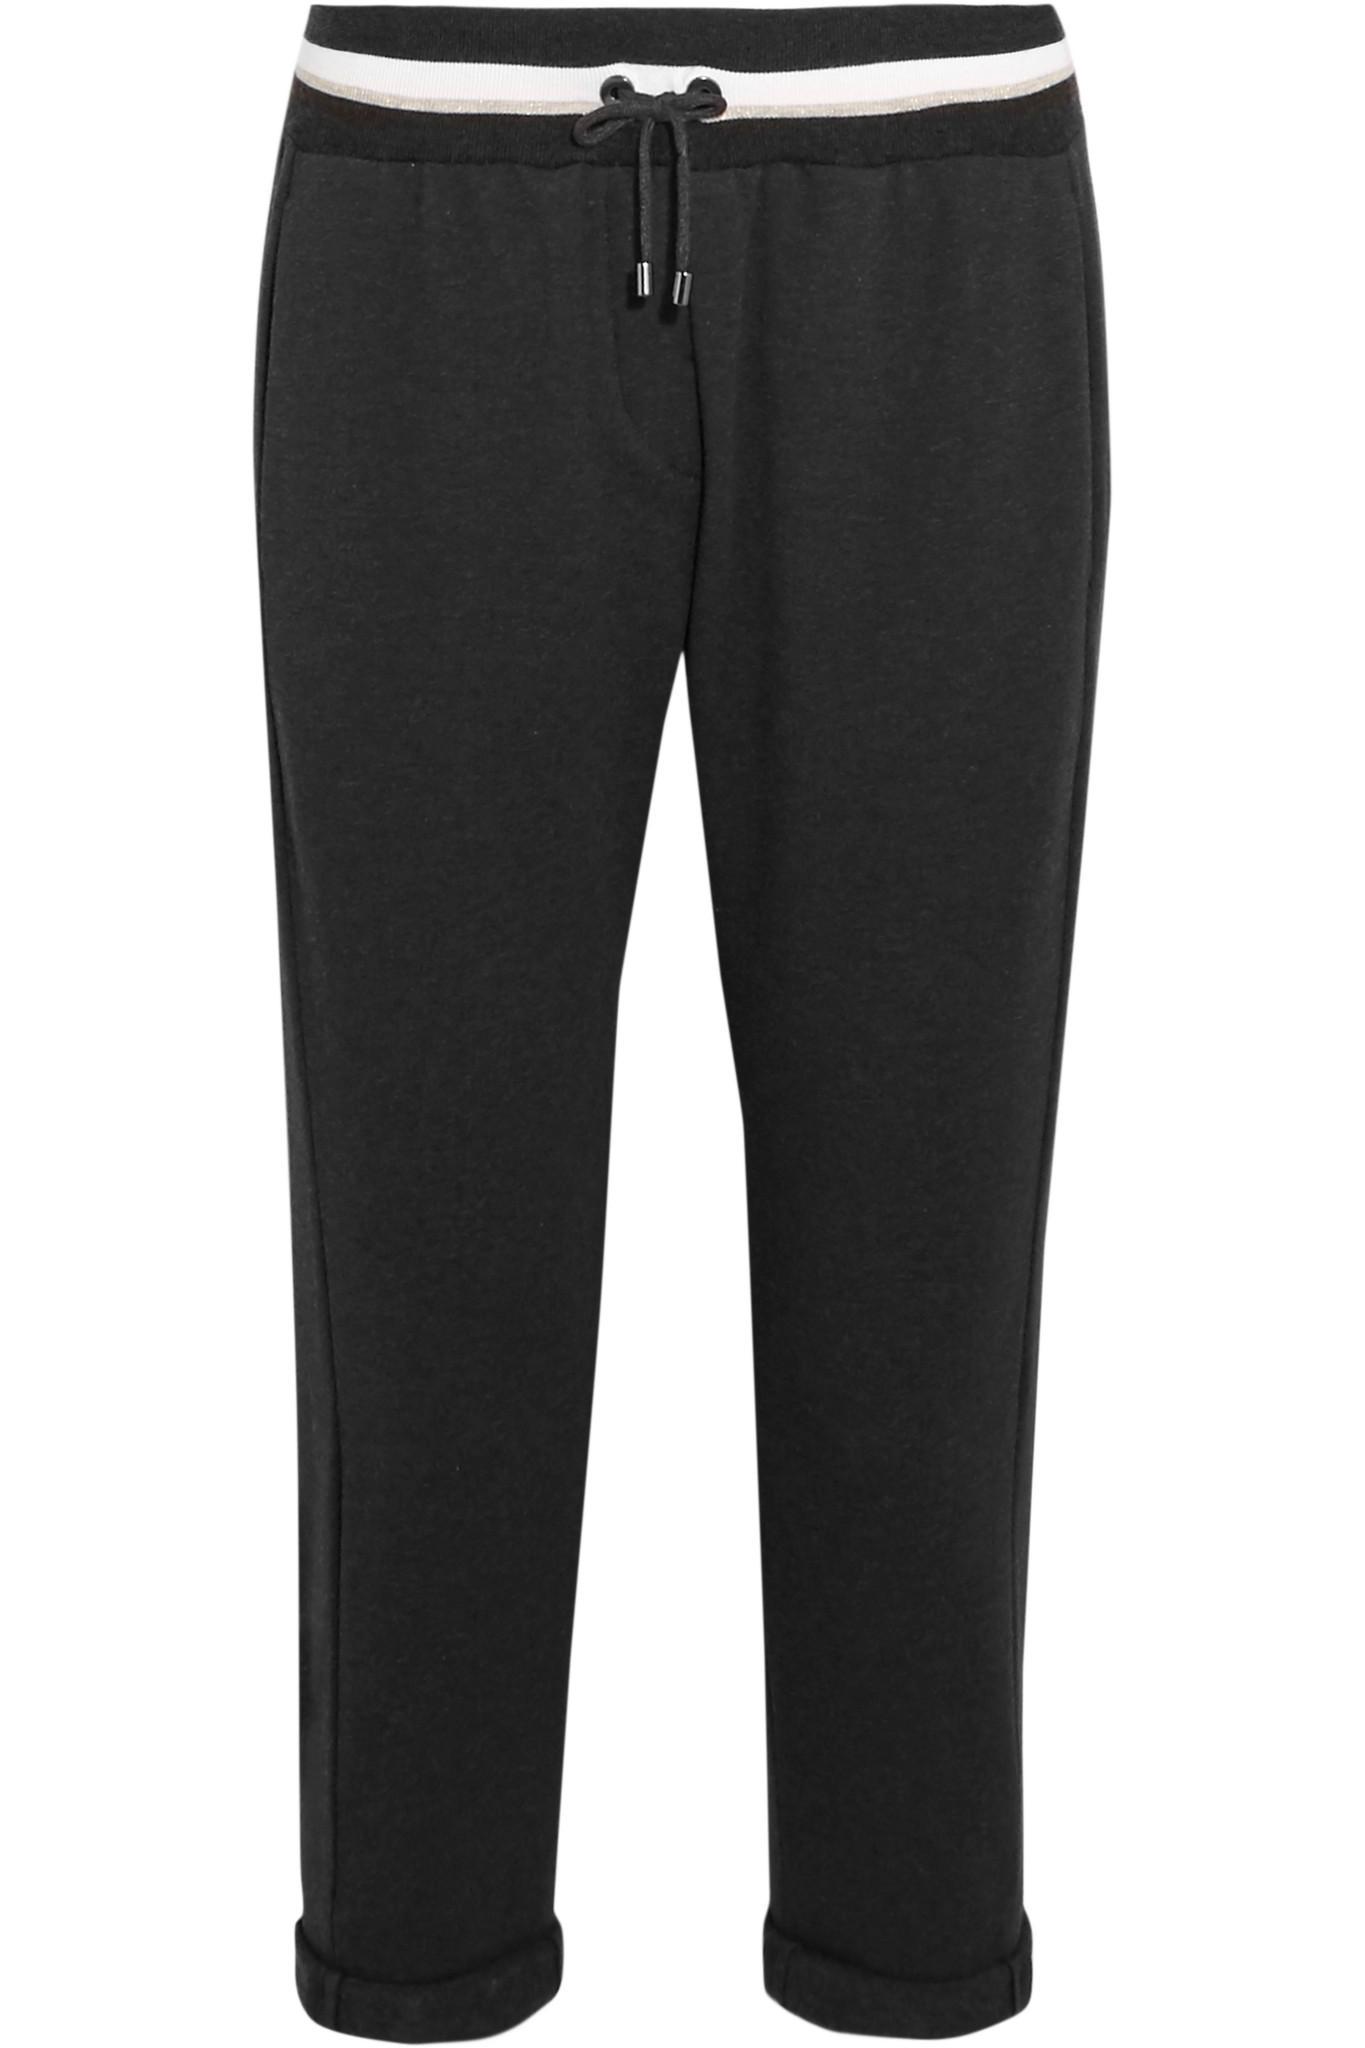 Wonderful Dries Van Noten Cotton Track Pants Grey Women TGNuU9hu736  4896